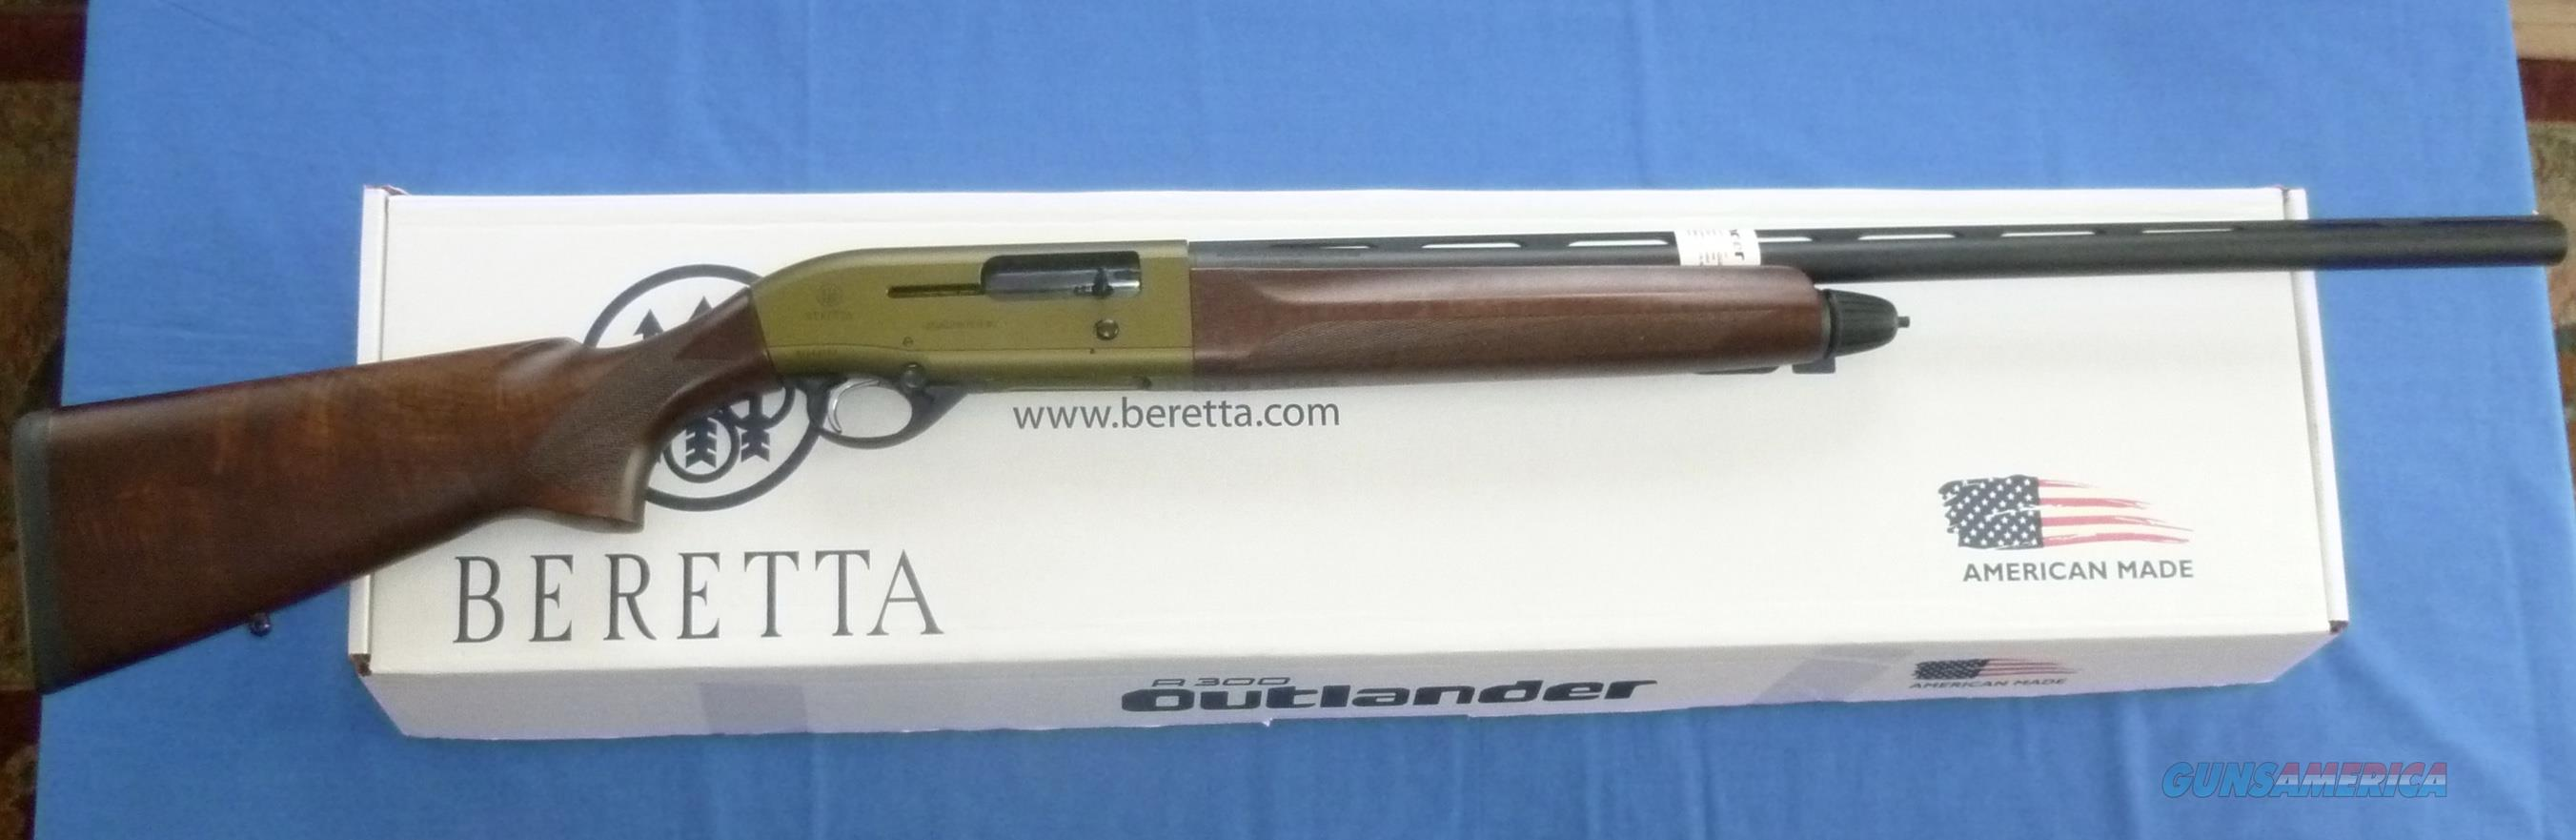 BERETTA A300 OUTLANDER MALLARD 12 GAUGE SEMI-AUTO SHOTGUN  Guns > Shotguns > Beretta Shotguns > Autoloaders > Hunting